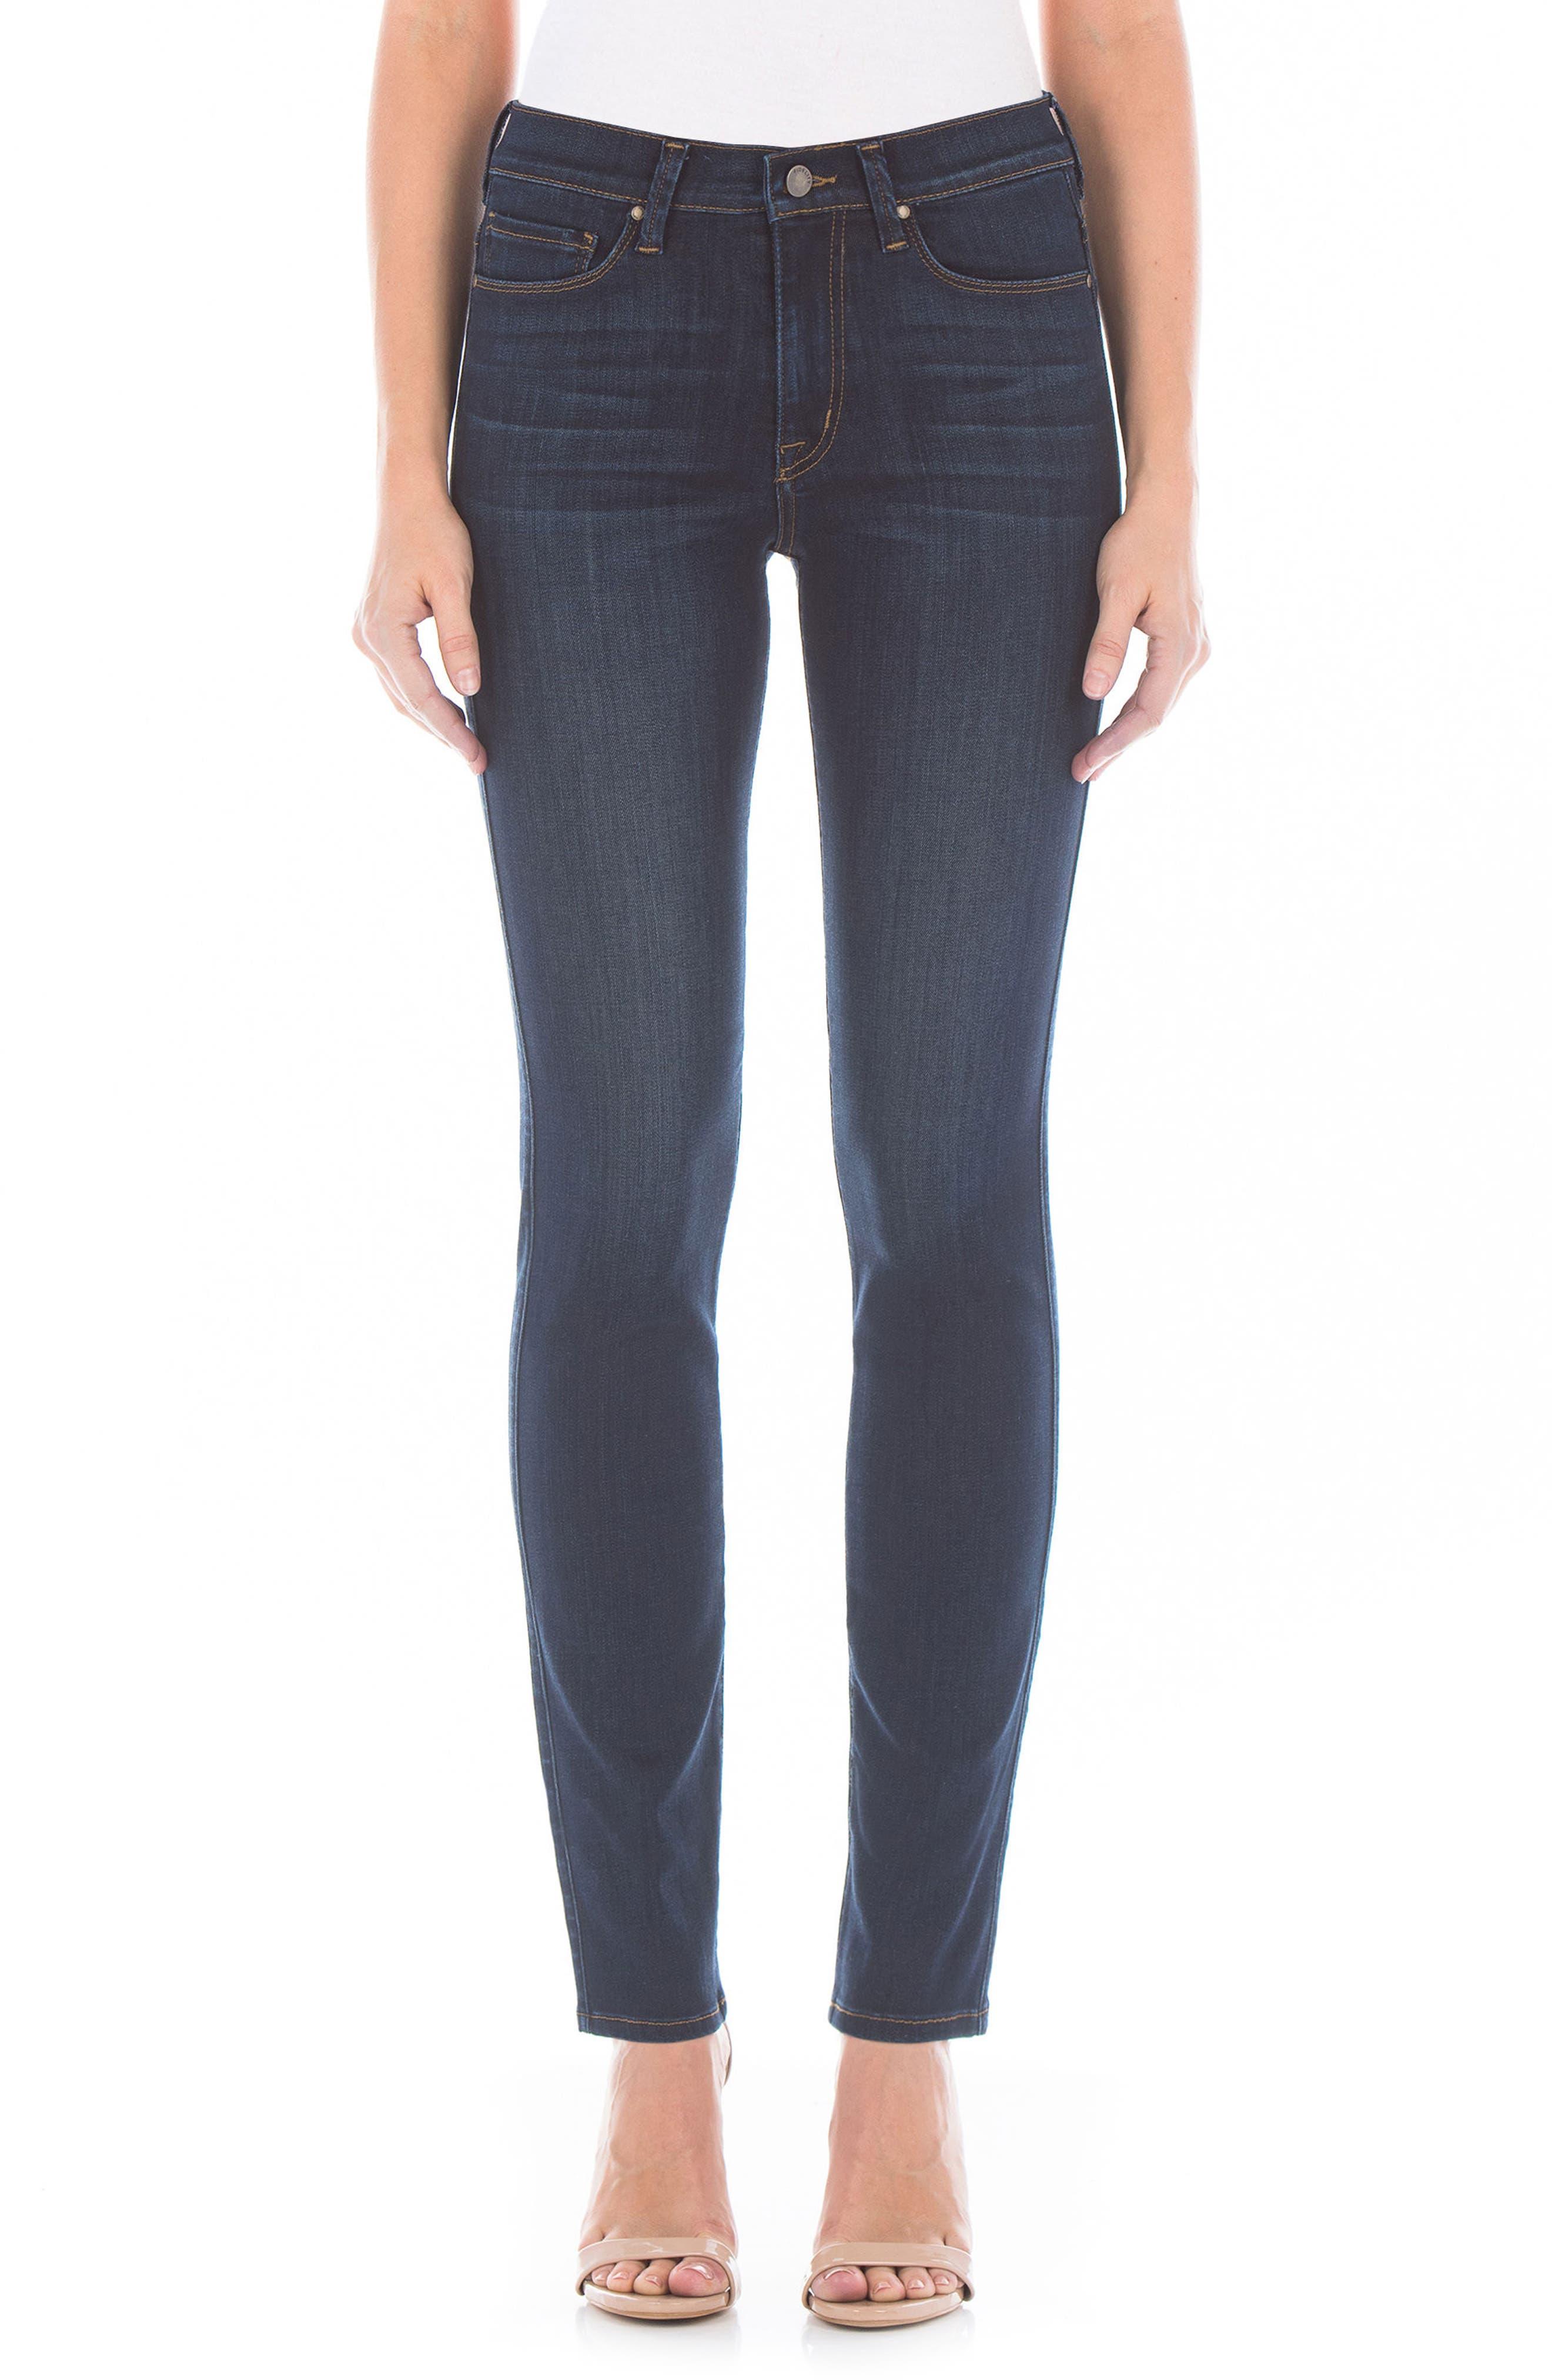 Fidelity Denim Cher High Waist Slim Jeans (Bali Blue)